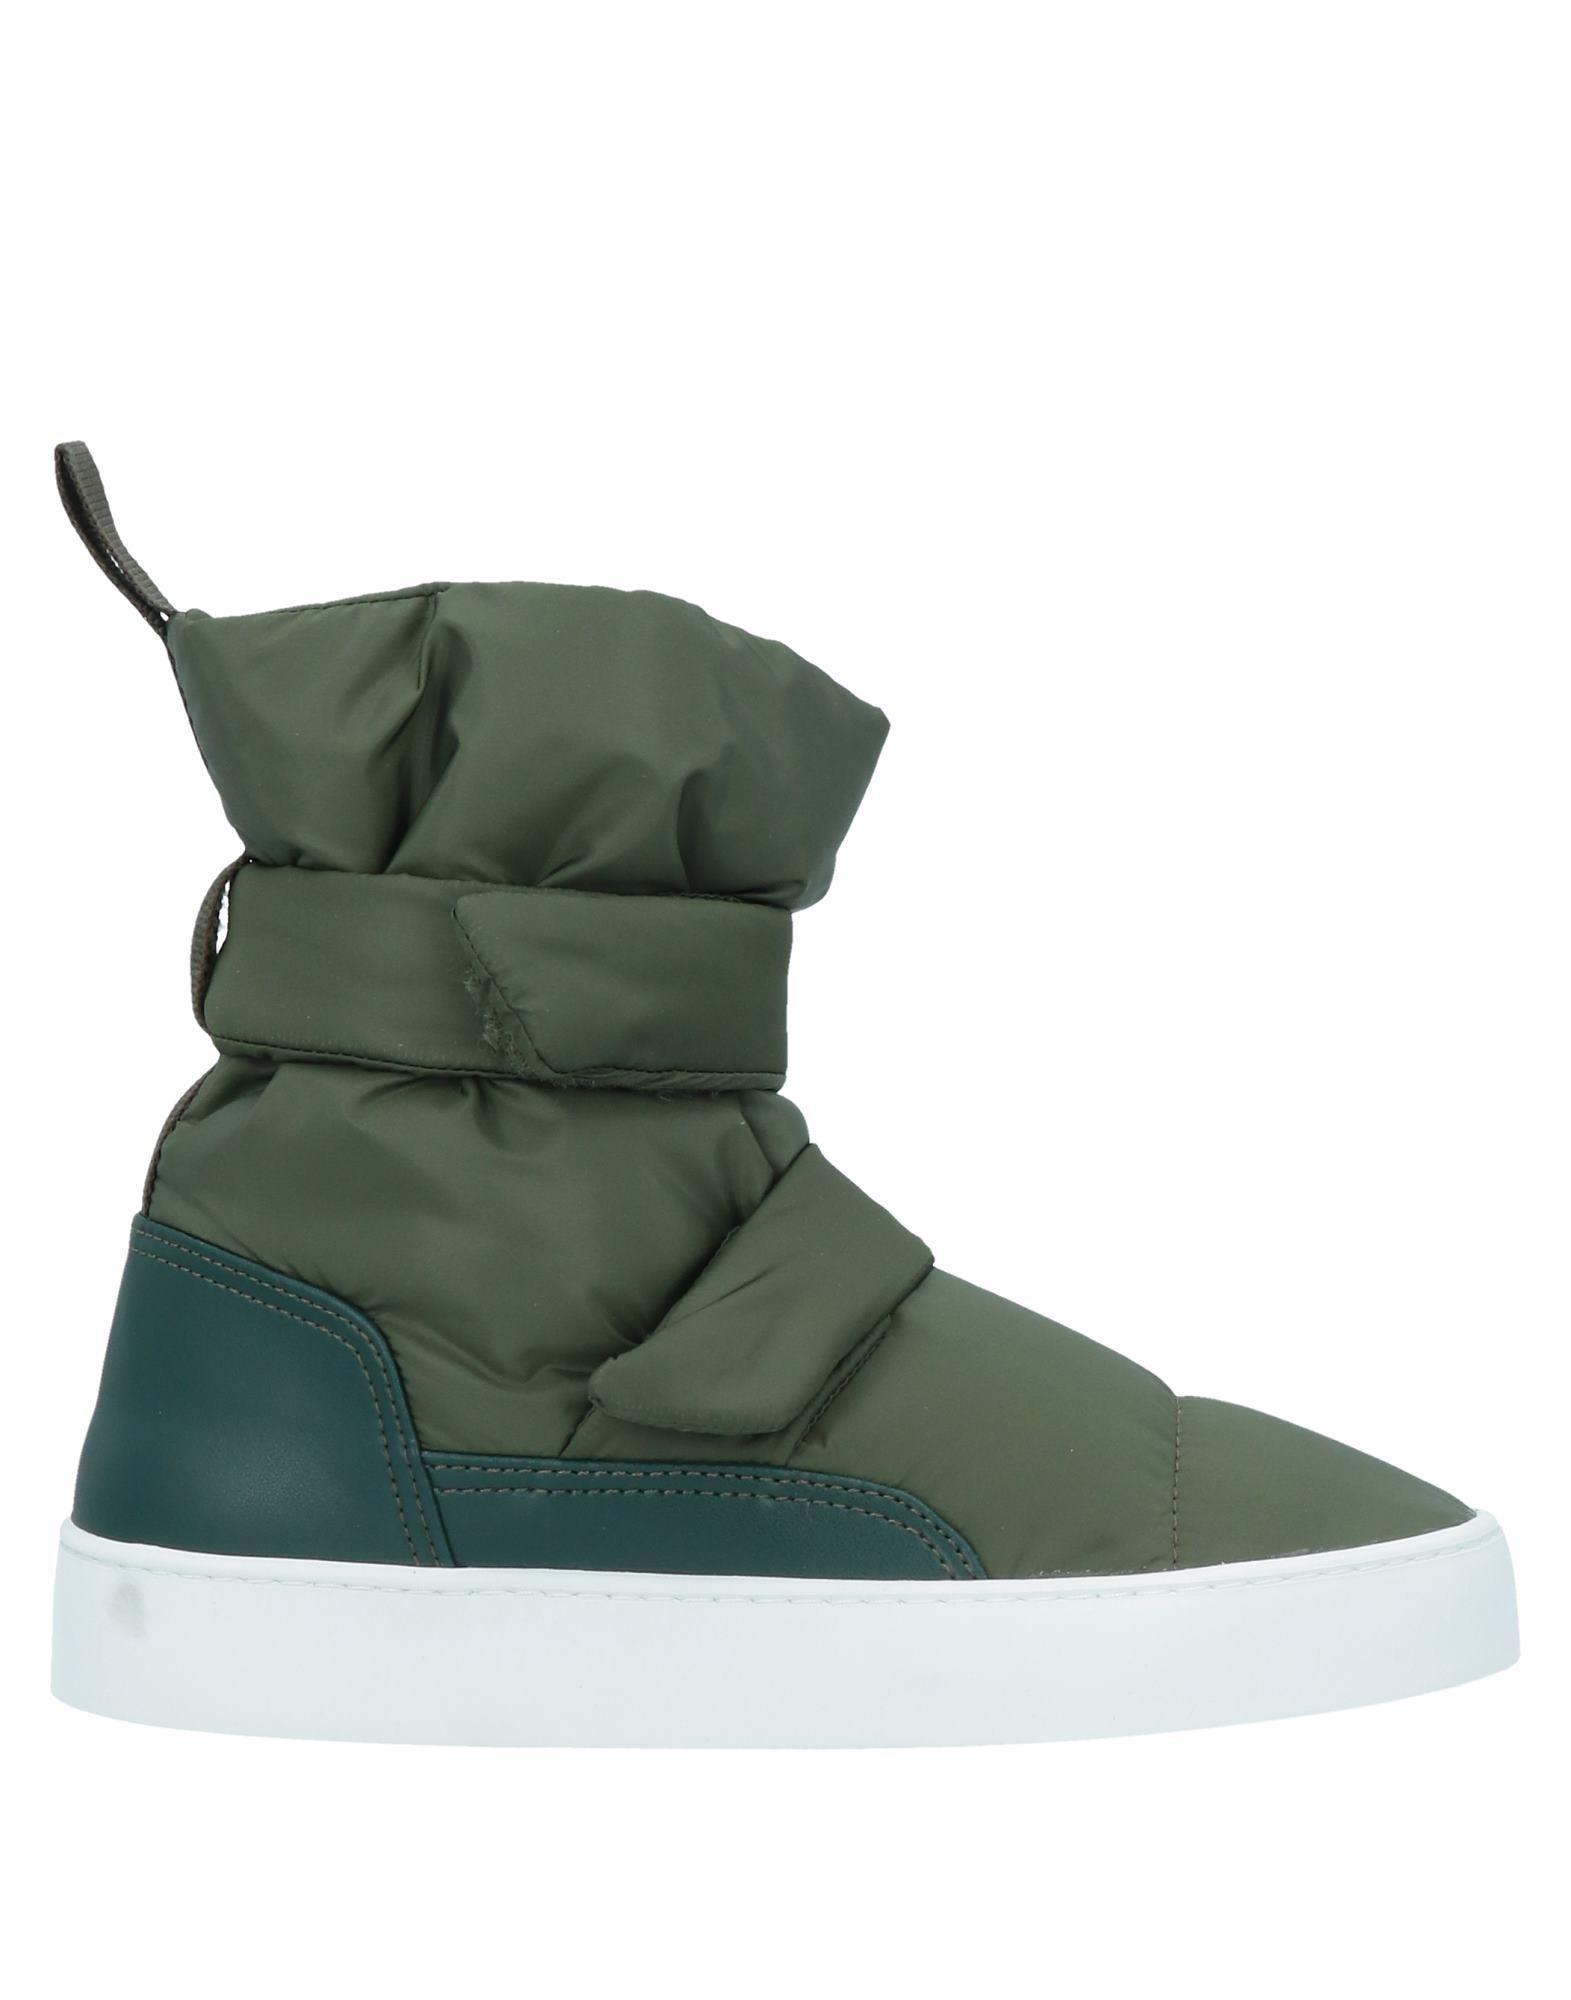 ZUCCA Полусапоги и высокие ботинки zucca полусапоги и высокие ботинки